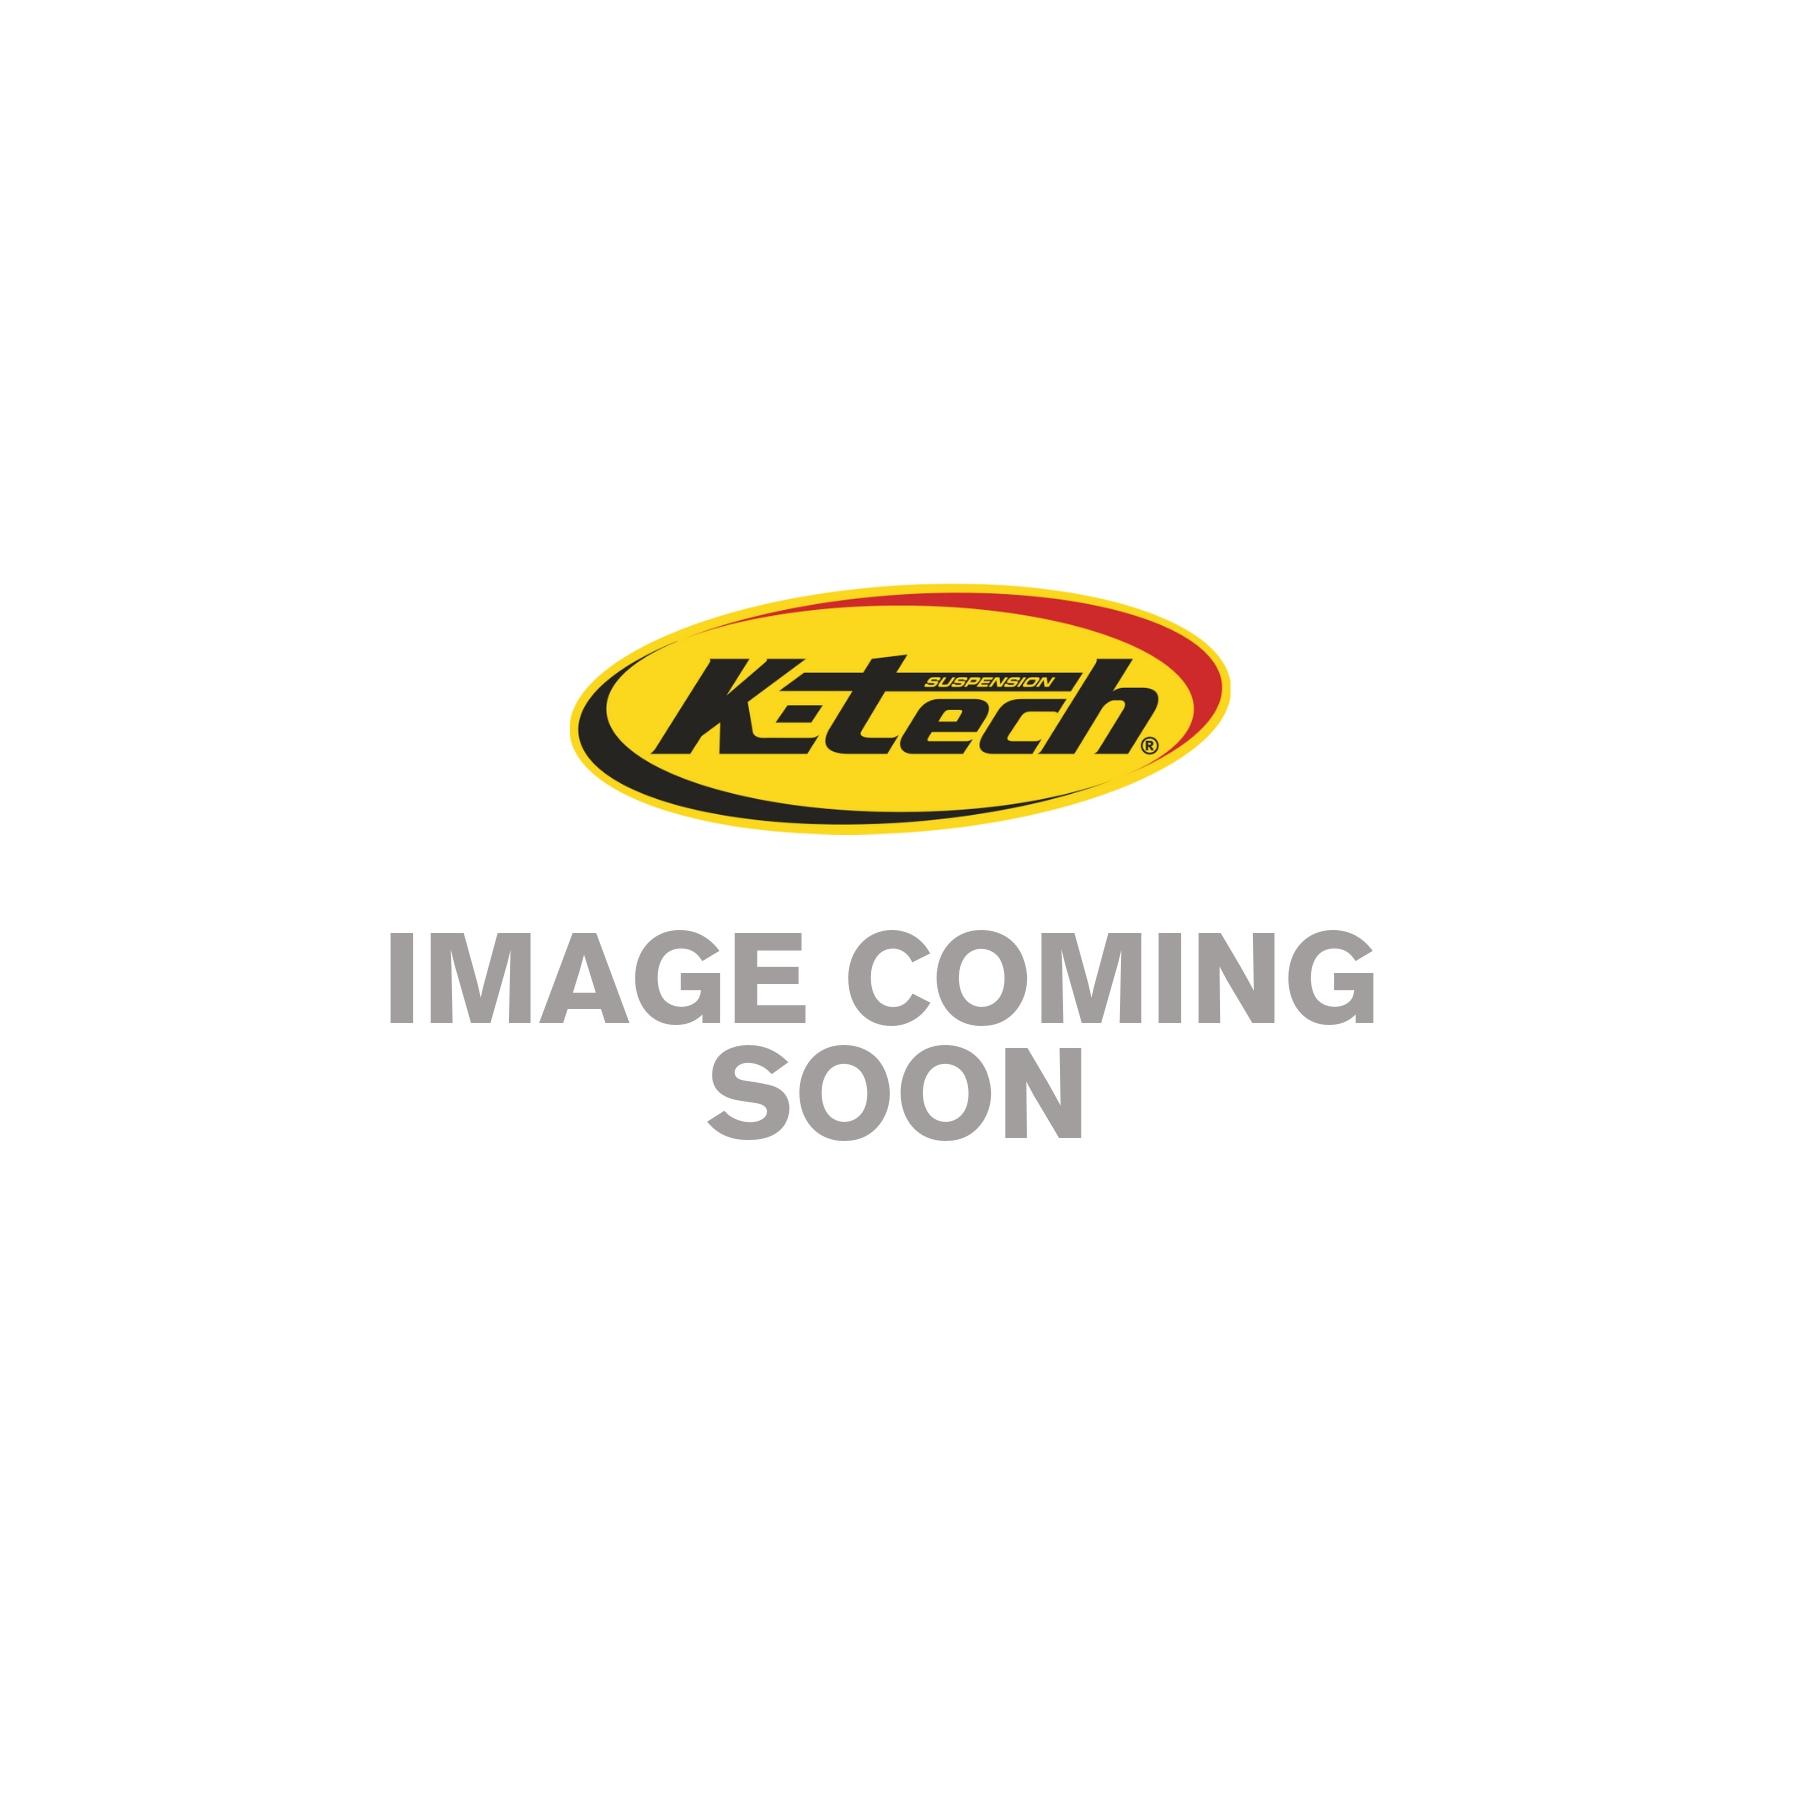 Tool - Shock Absorber Spring Jack Insert -(76.00x65.00) Ohlins TTX